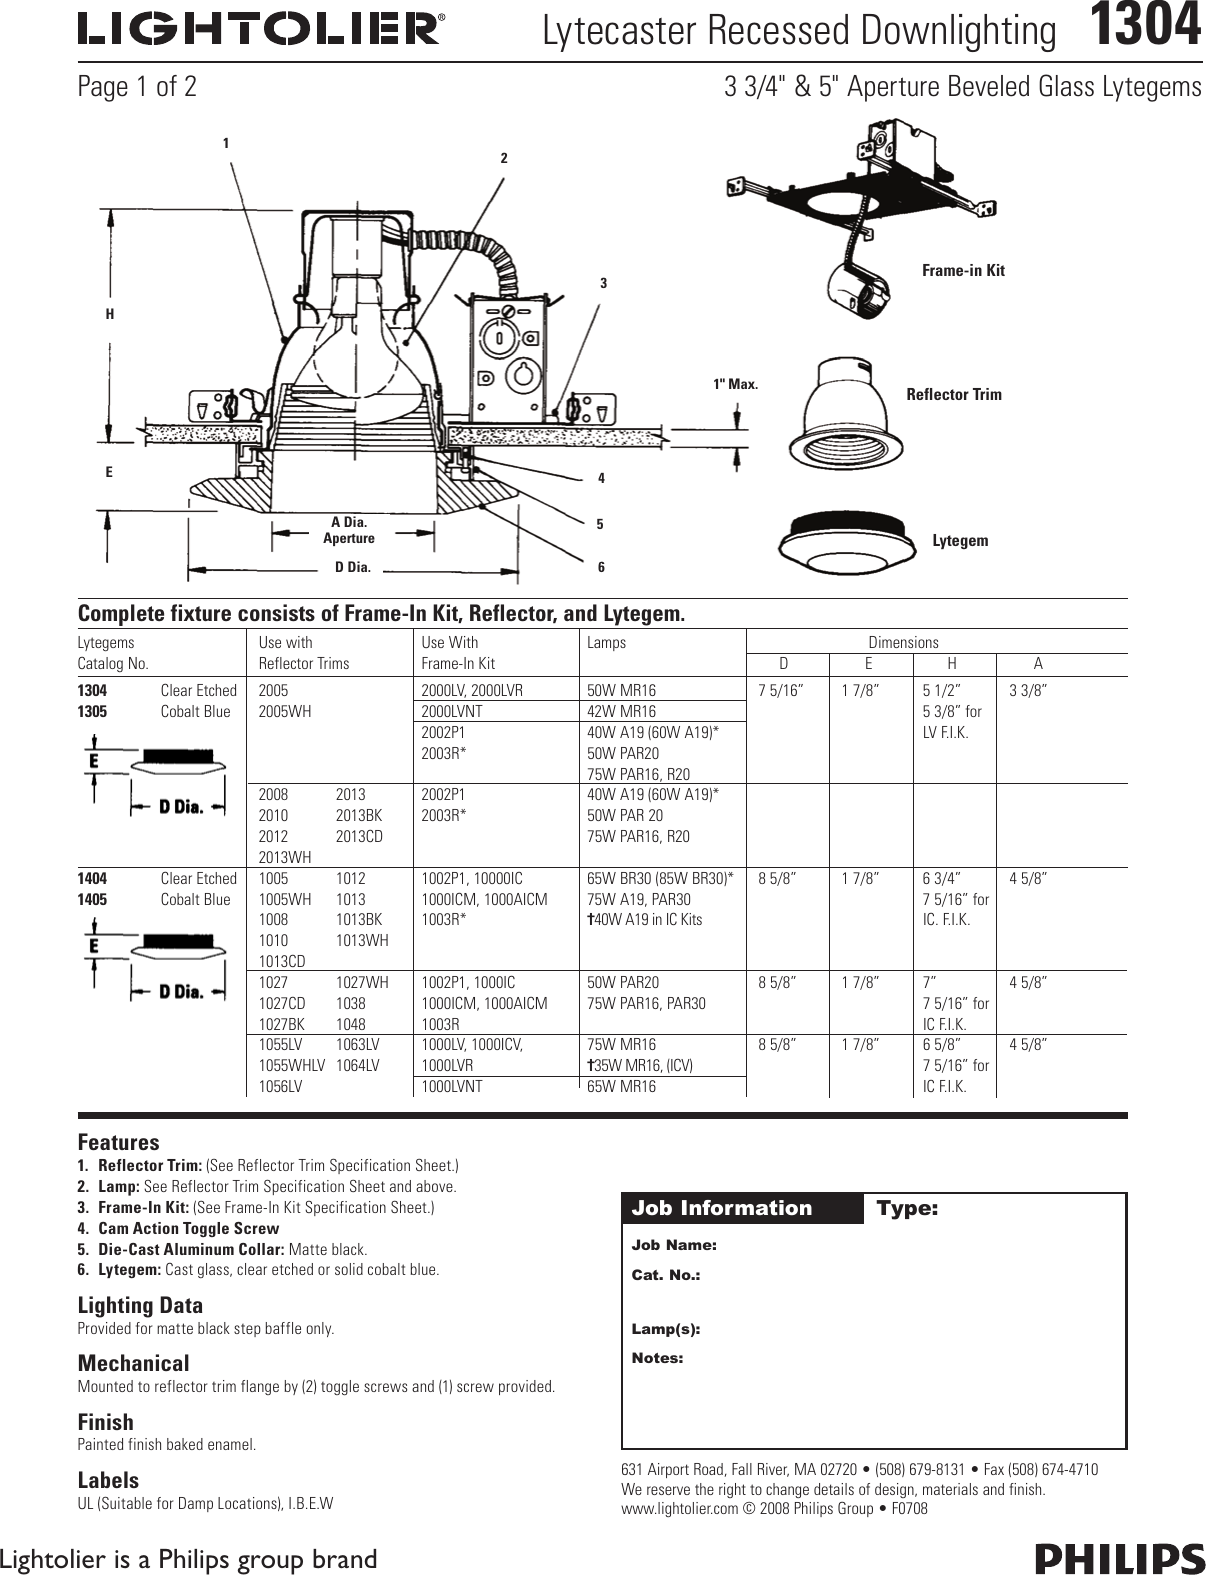 Lightolier Lytecaster Recessed Downlighting 1304 Users Manual